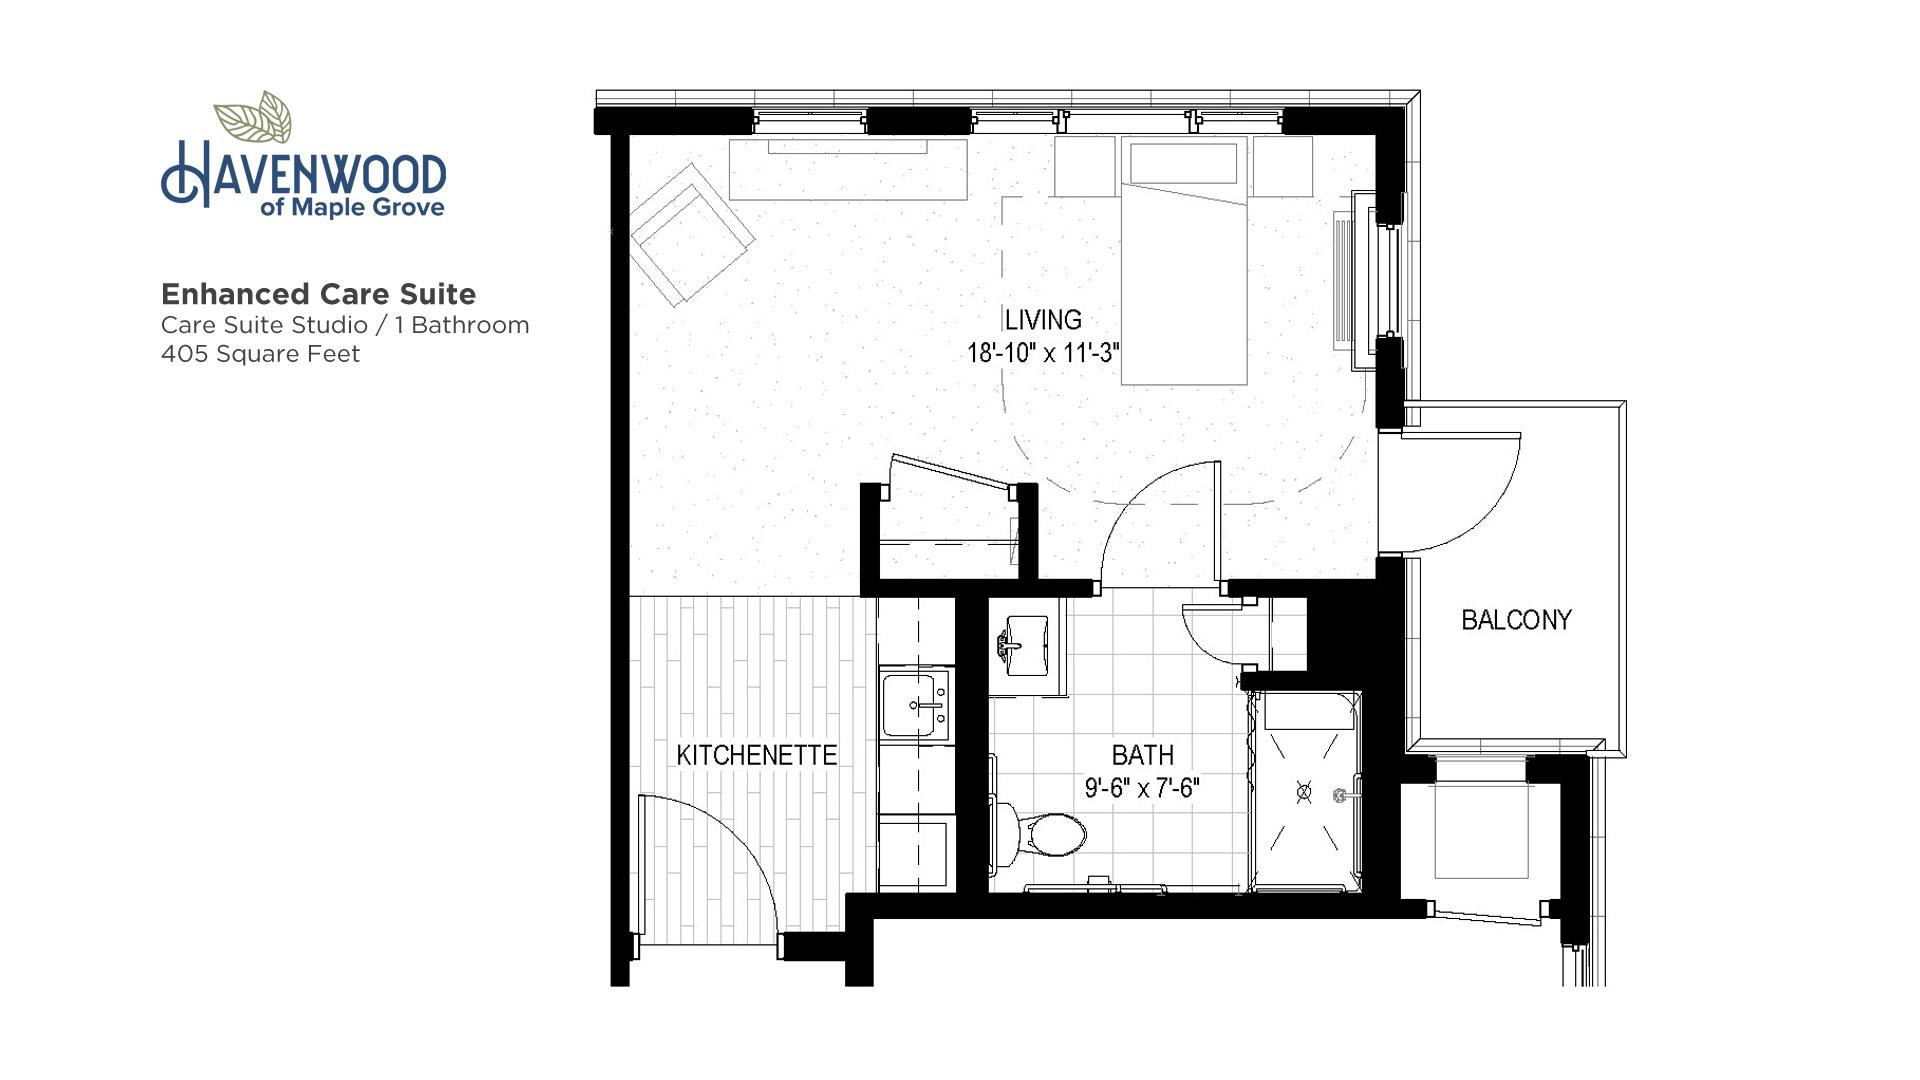 Havenwood of Maple Grove Enhanced Care Suite Floor Plan